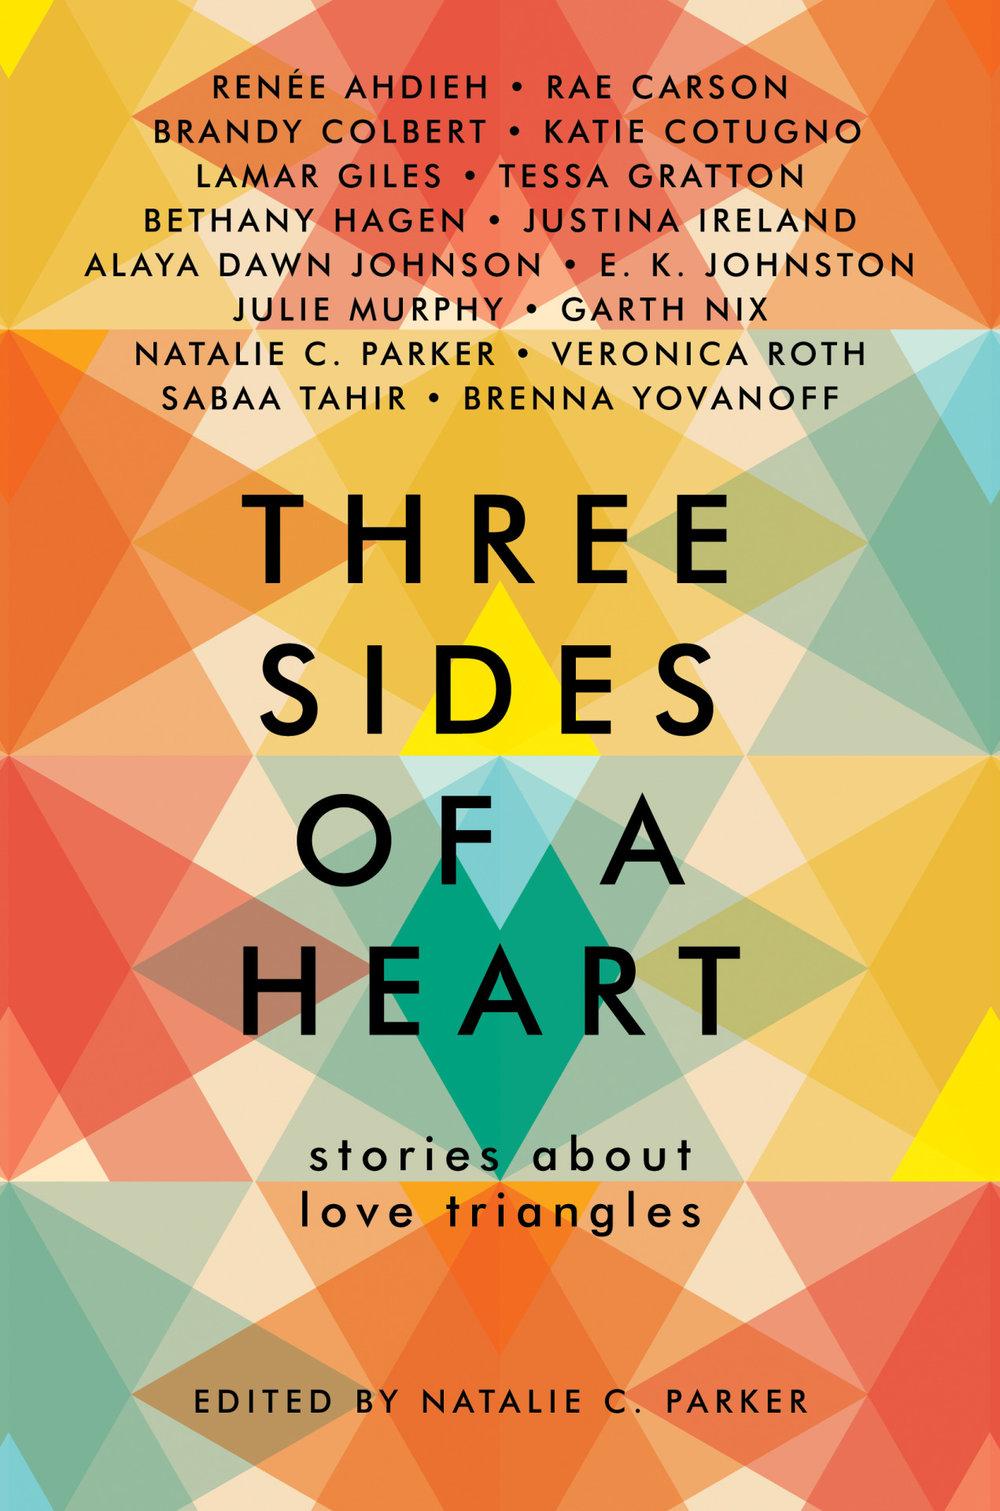 justina-ireland-three-sides-heart.jpg